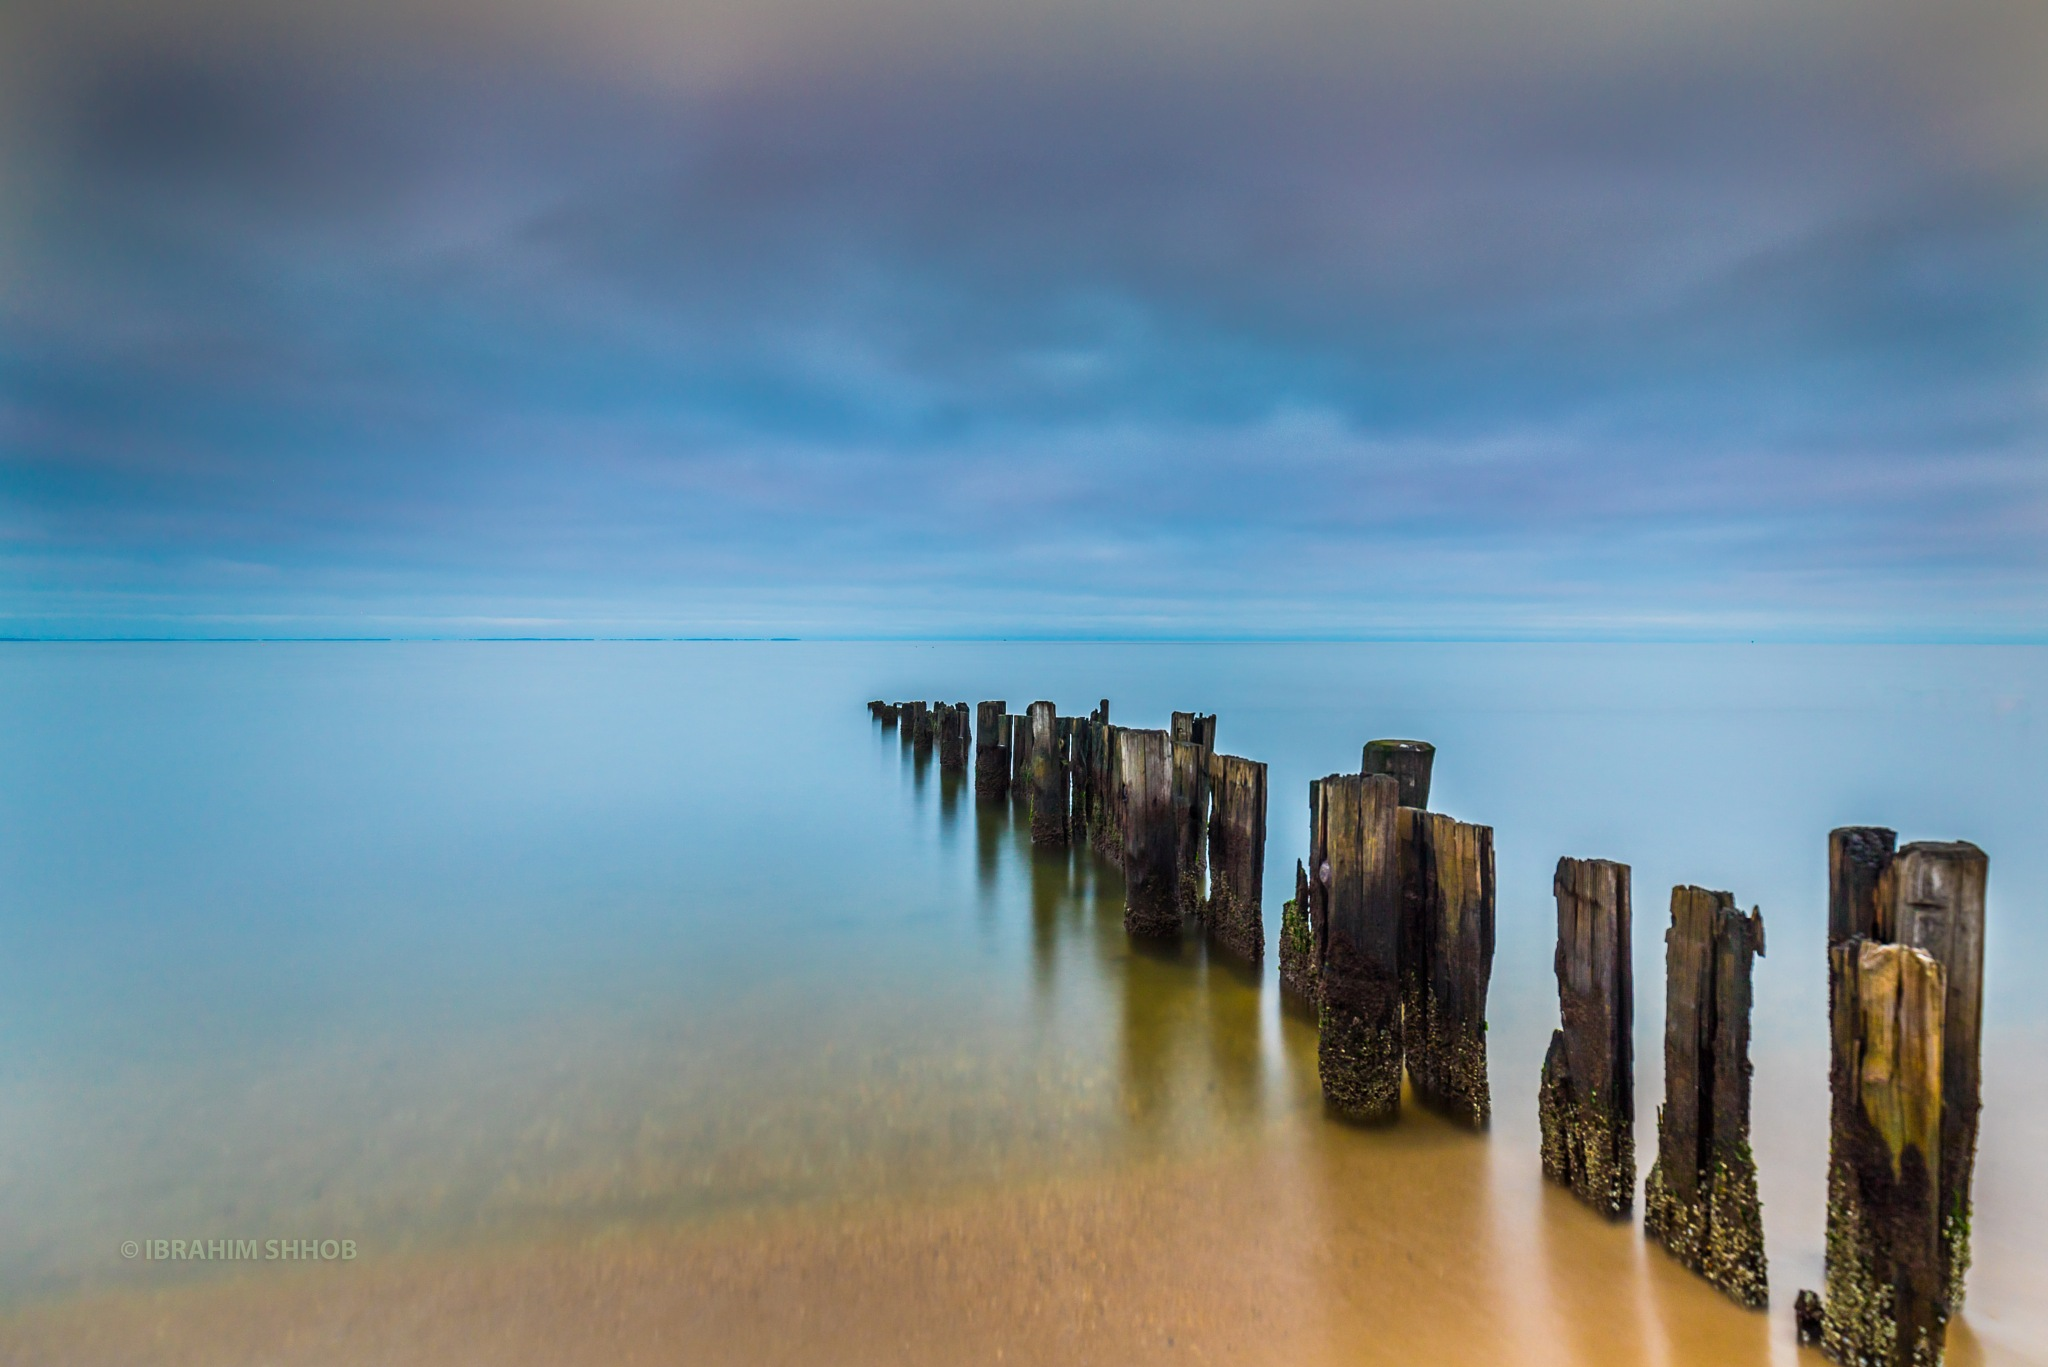 North Beach MD 3 by Ibrahim shhob